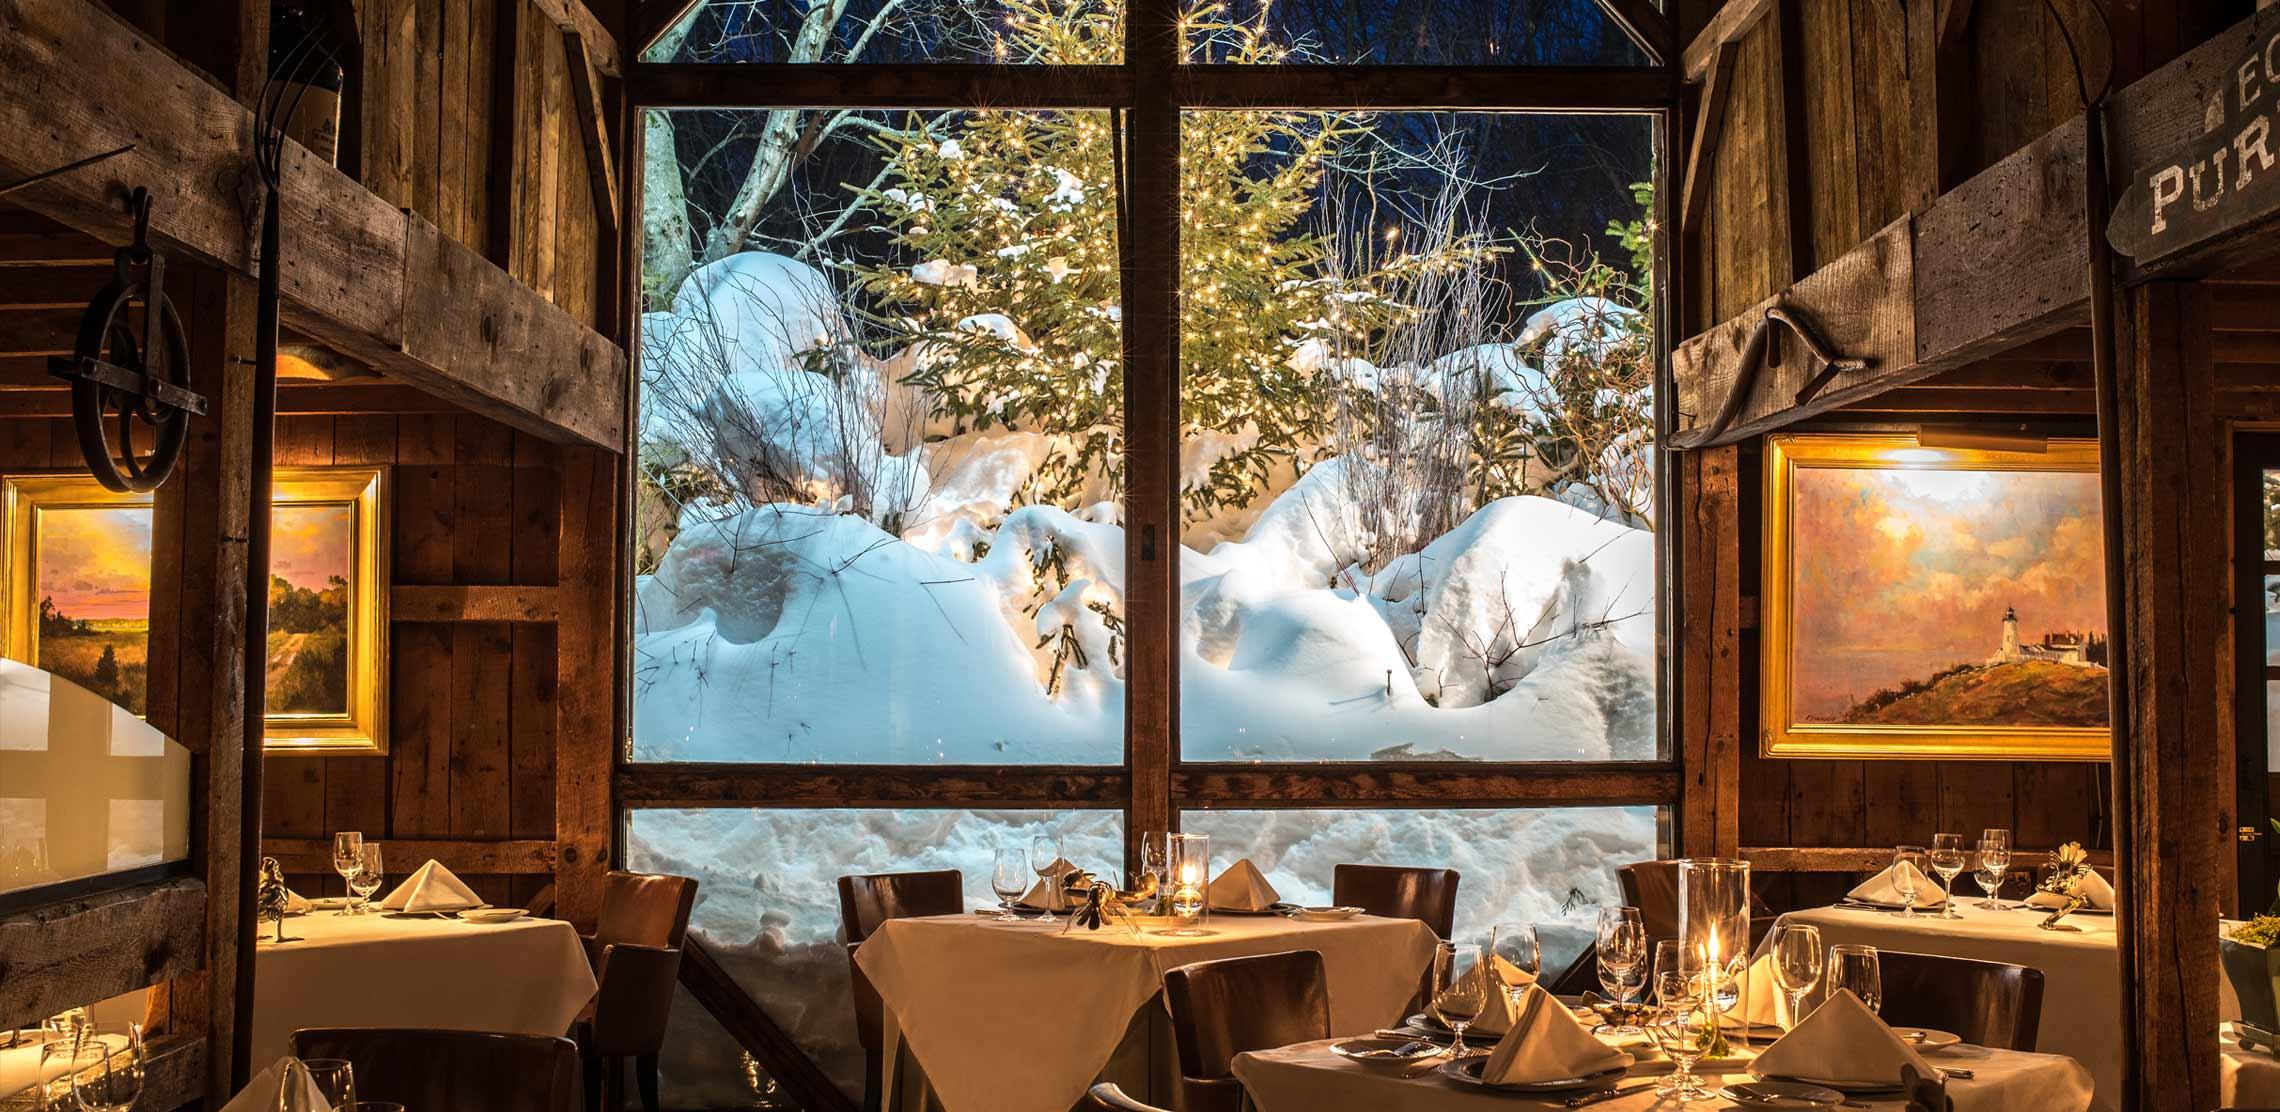 50 Most Romantic Restaurants Best Restaurants For